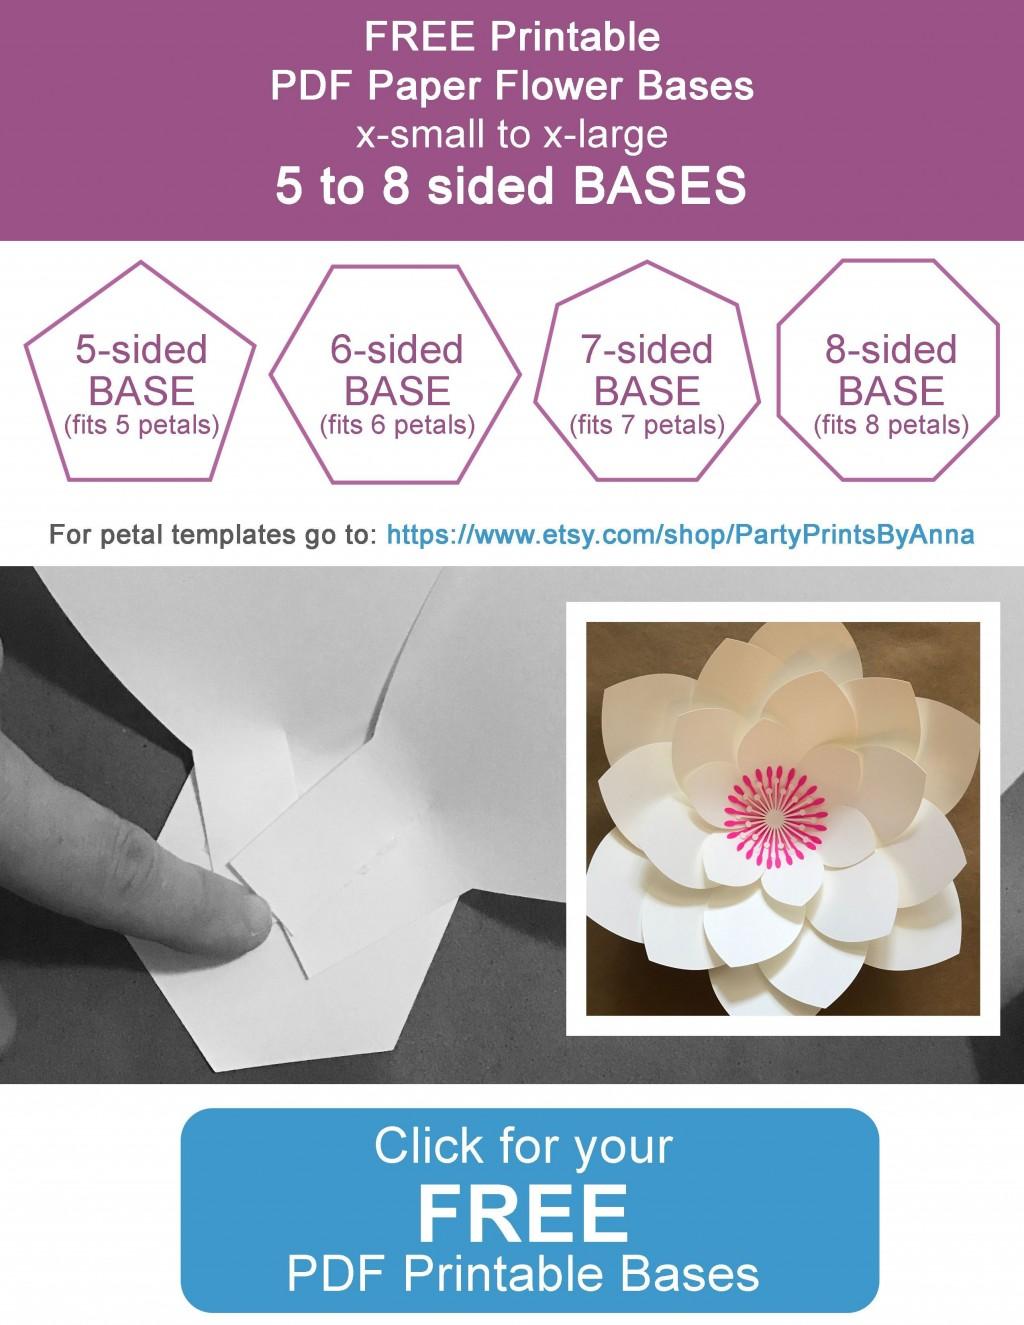 004 Striking Free Printable Diy Paper Flower Template Image  TemplatesLarge